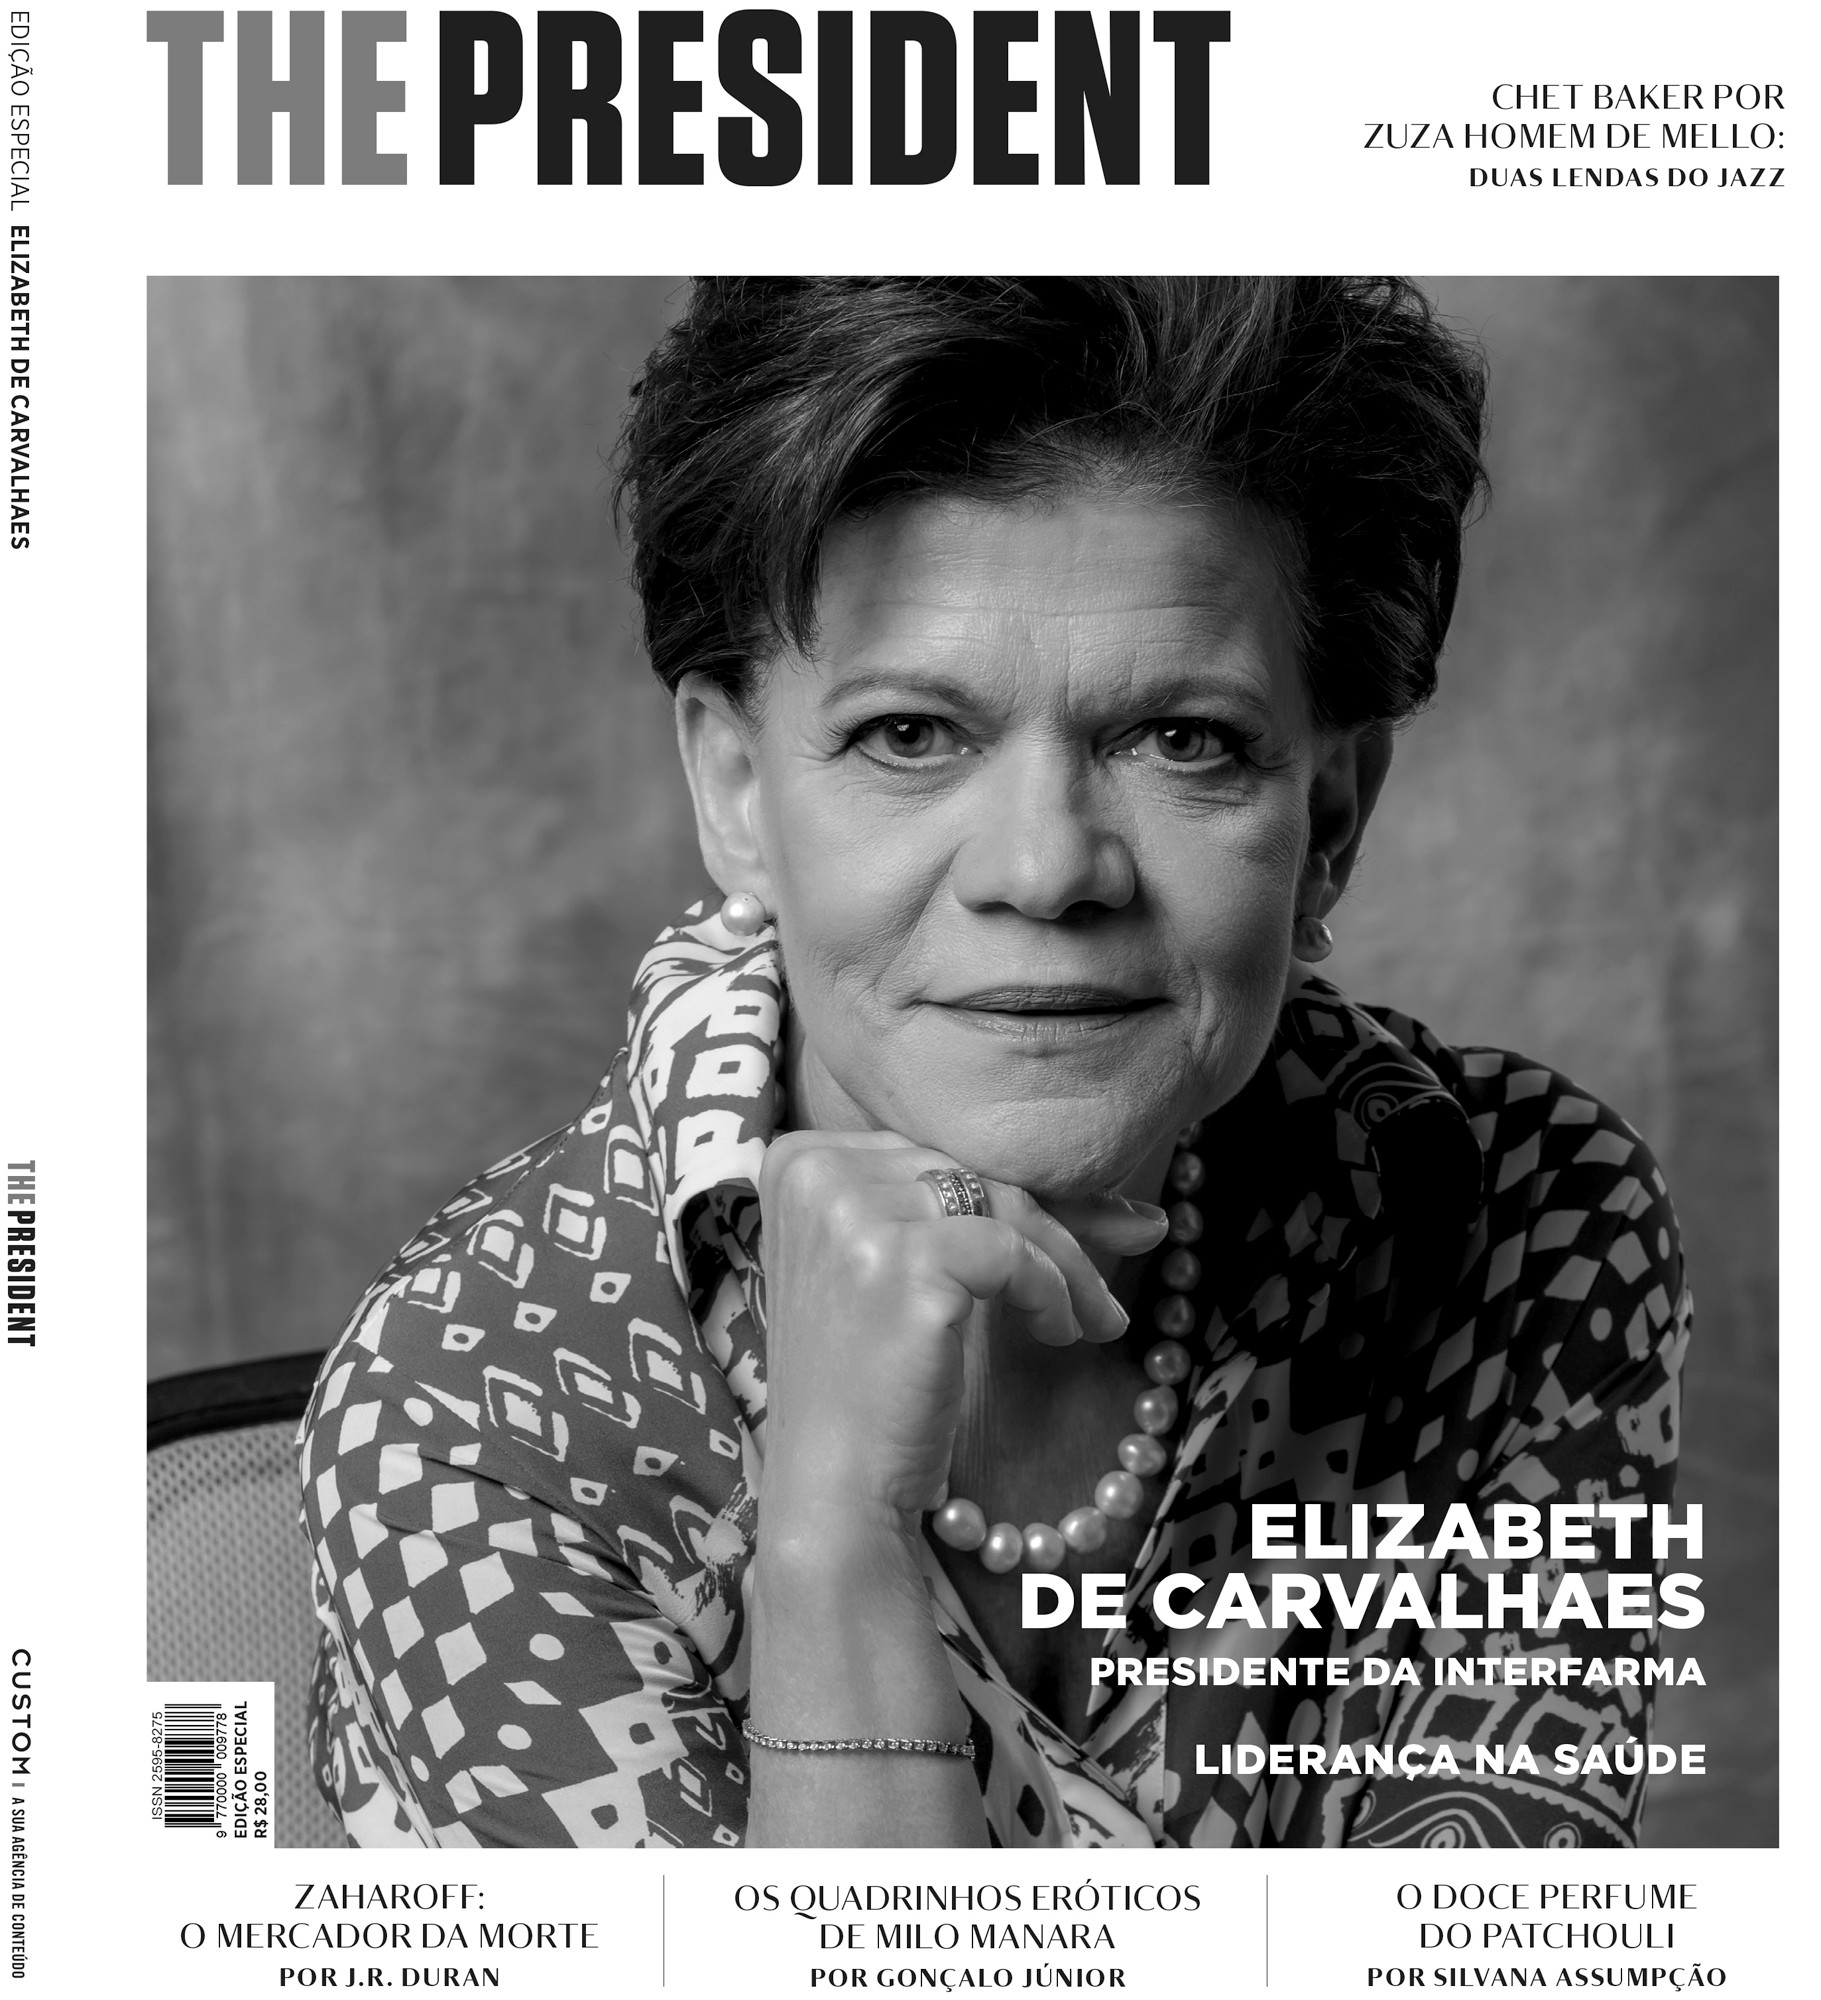 Editorial portrait of Elizabeth de Carvalhaes